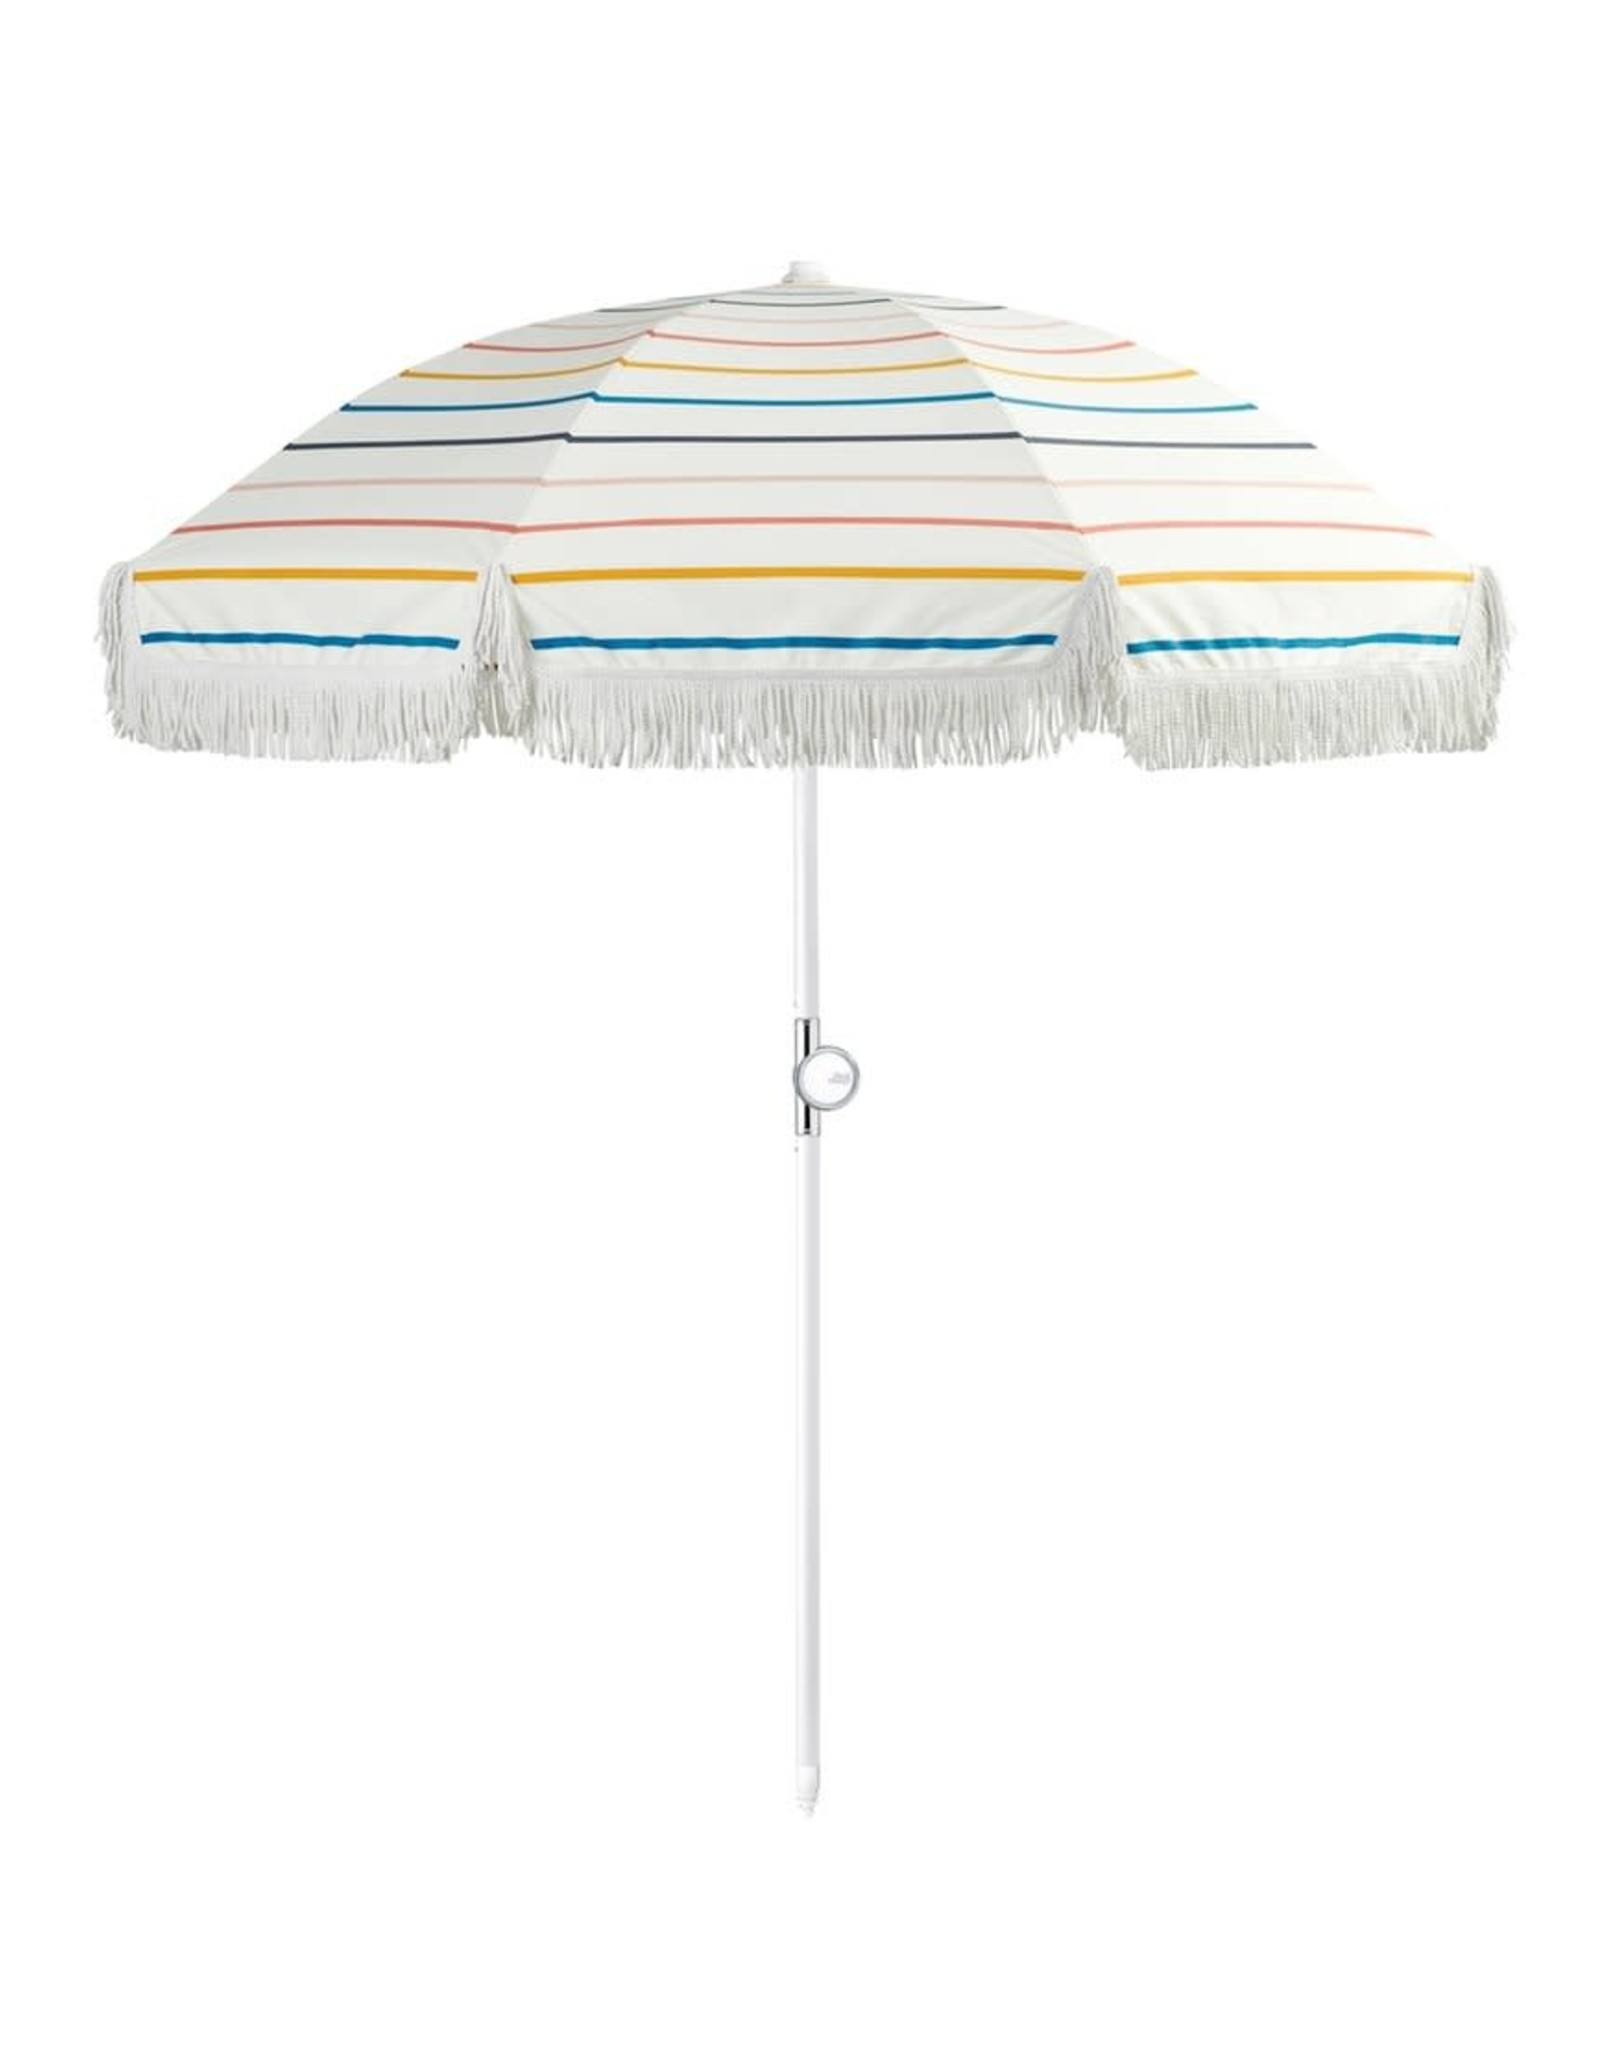 Daydreaming Beach Umbrella